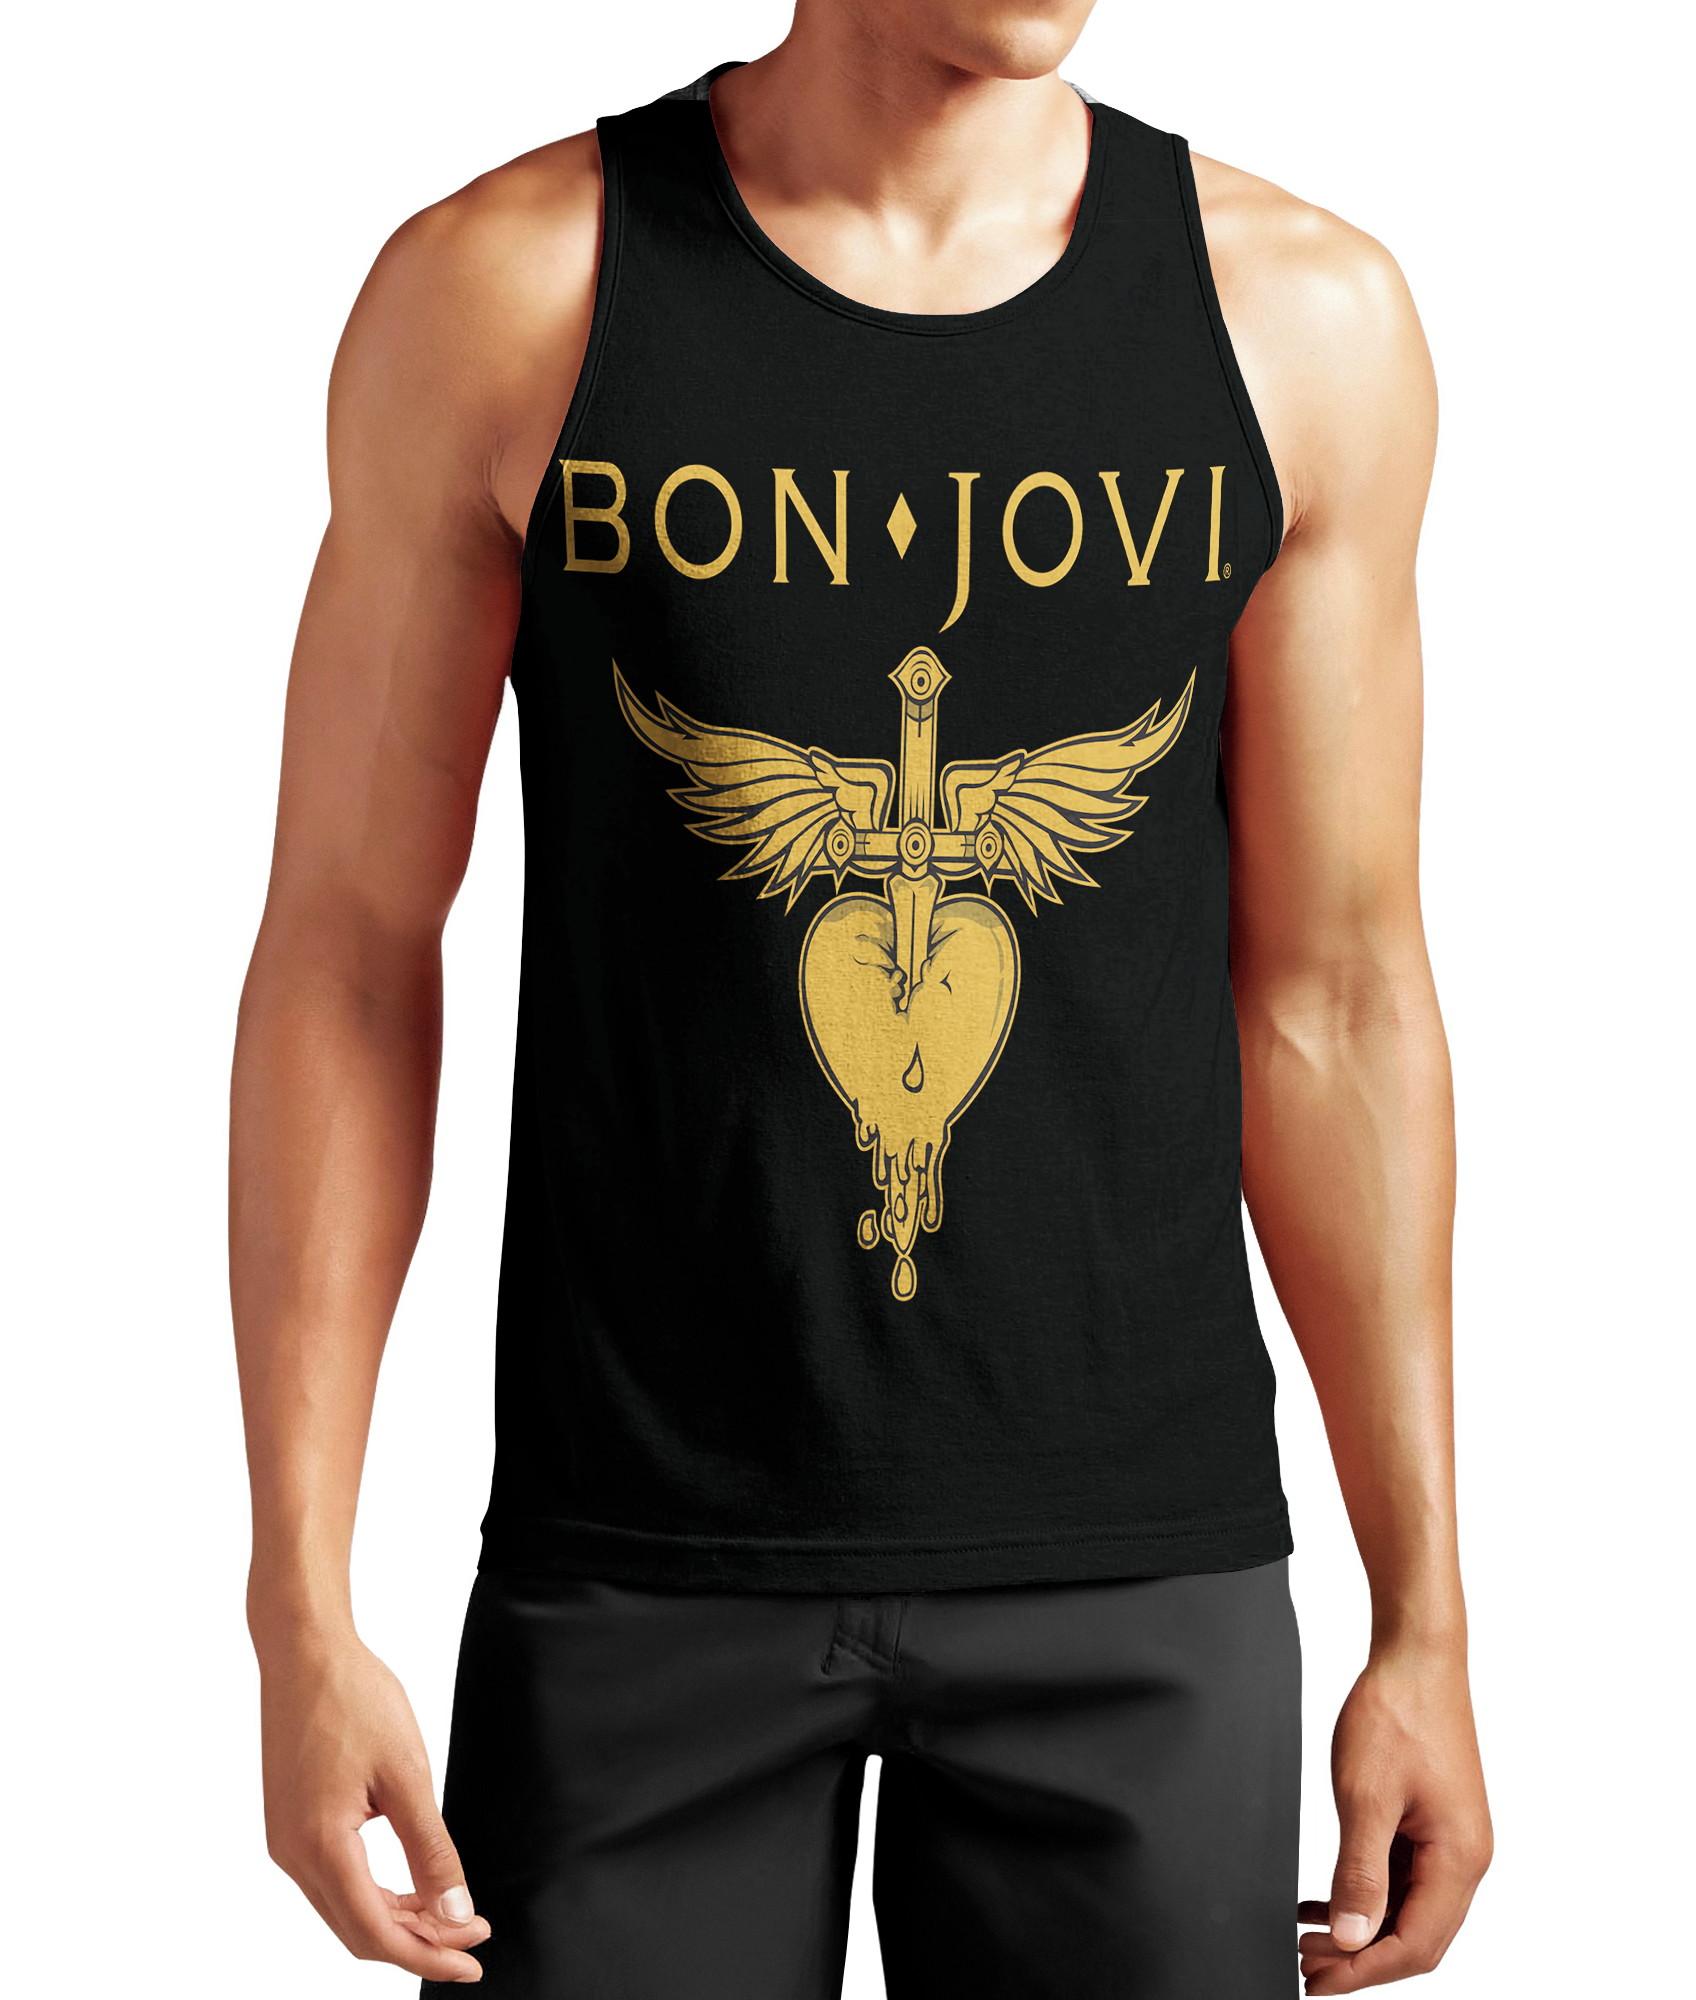 74343b383eff0 regata Camisa Bon Jovi Pop Rock Banda Manga Curta 785 no Elo7 | snarf  (E8AD54)